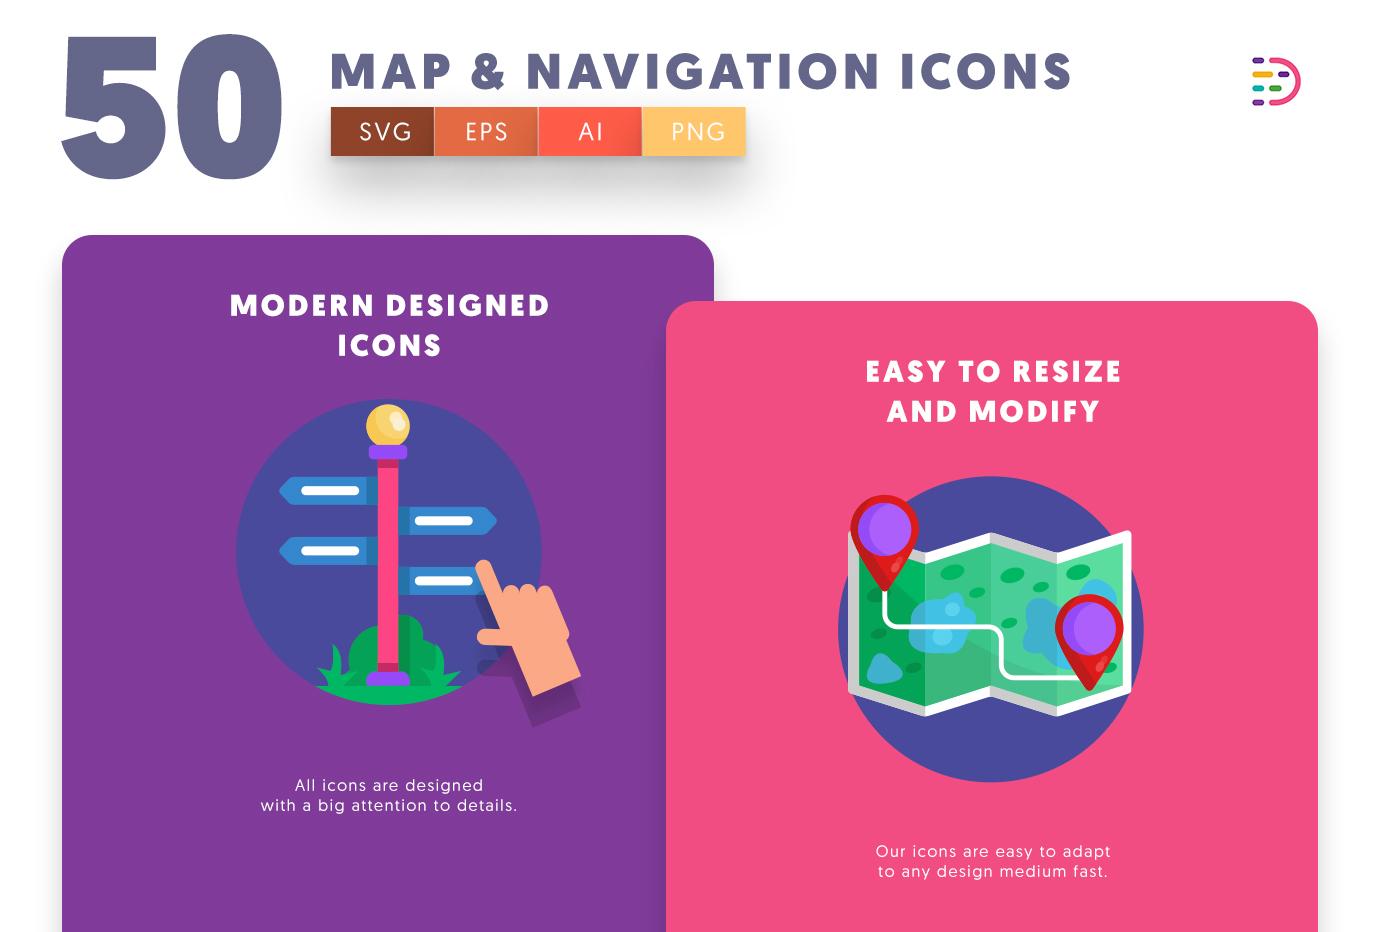 Drag and drop vector 50 Map & Navigation Icons